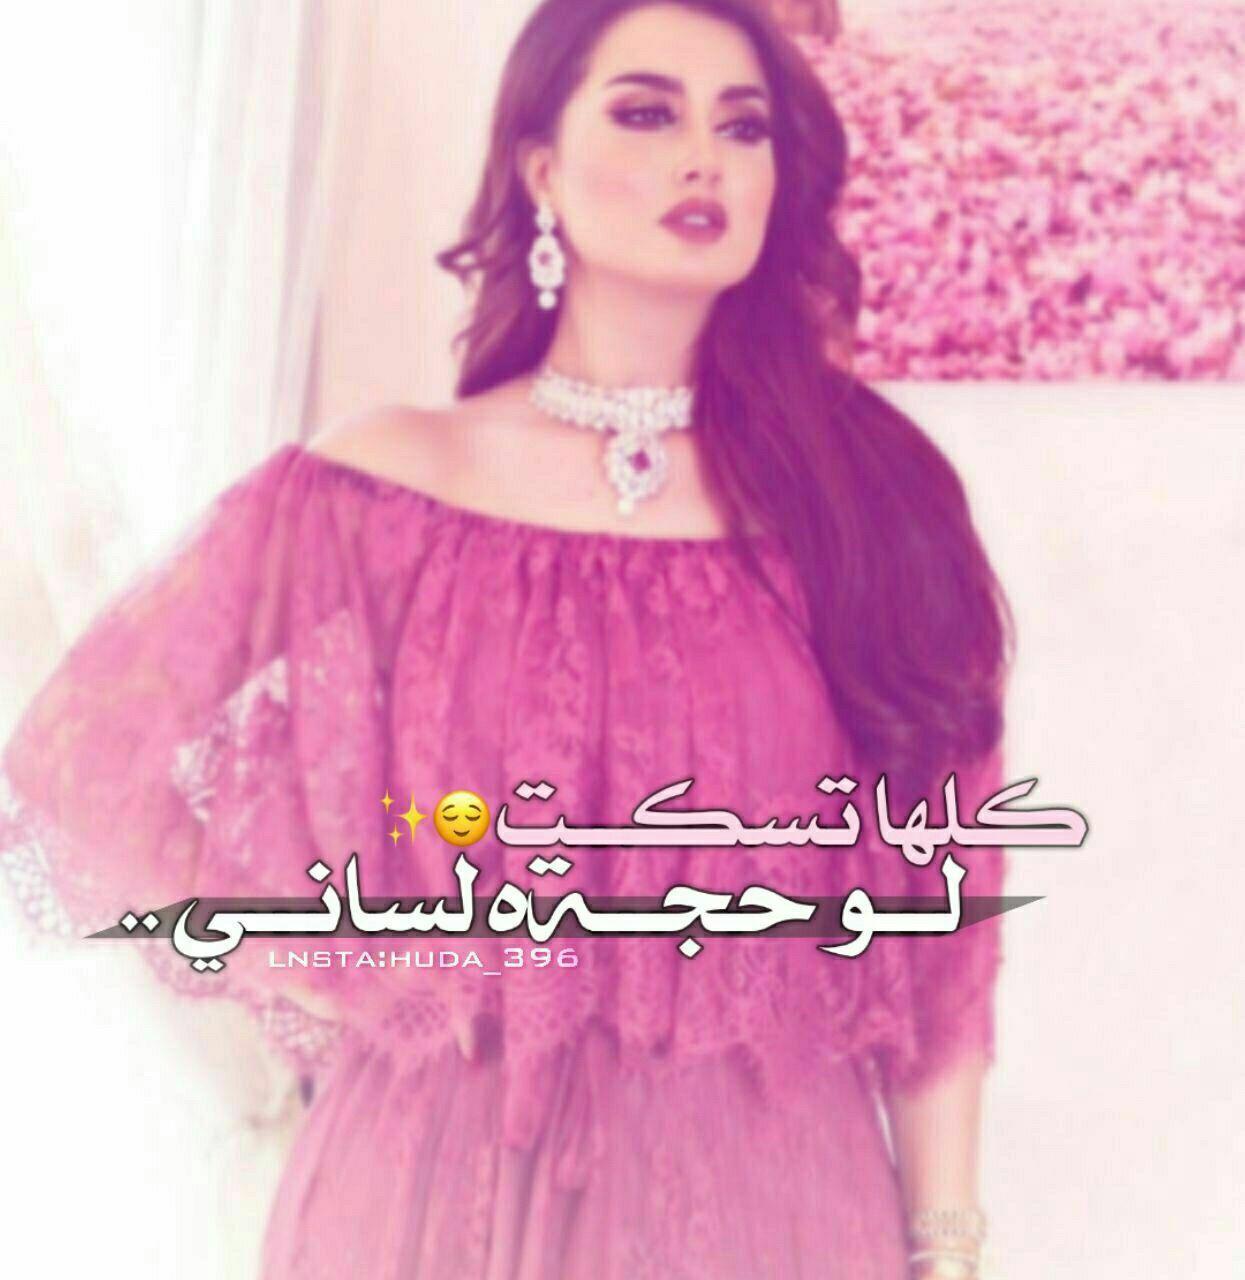 Pin By بنت محمد On كبرياء انثي Beautiful Women Faces Wedding Hairstyles Bride Stylish Girl Pic